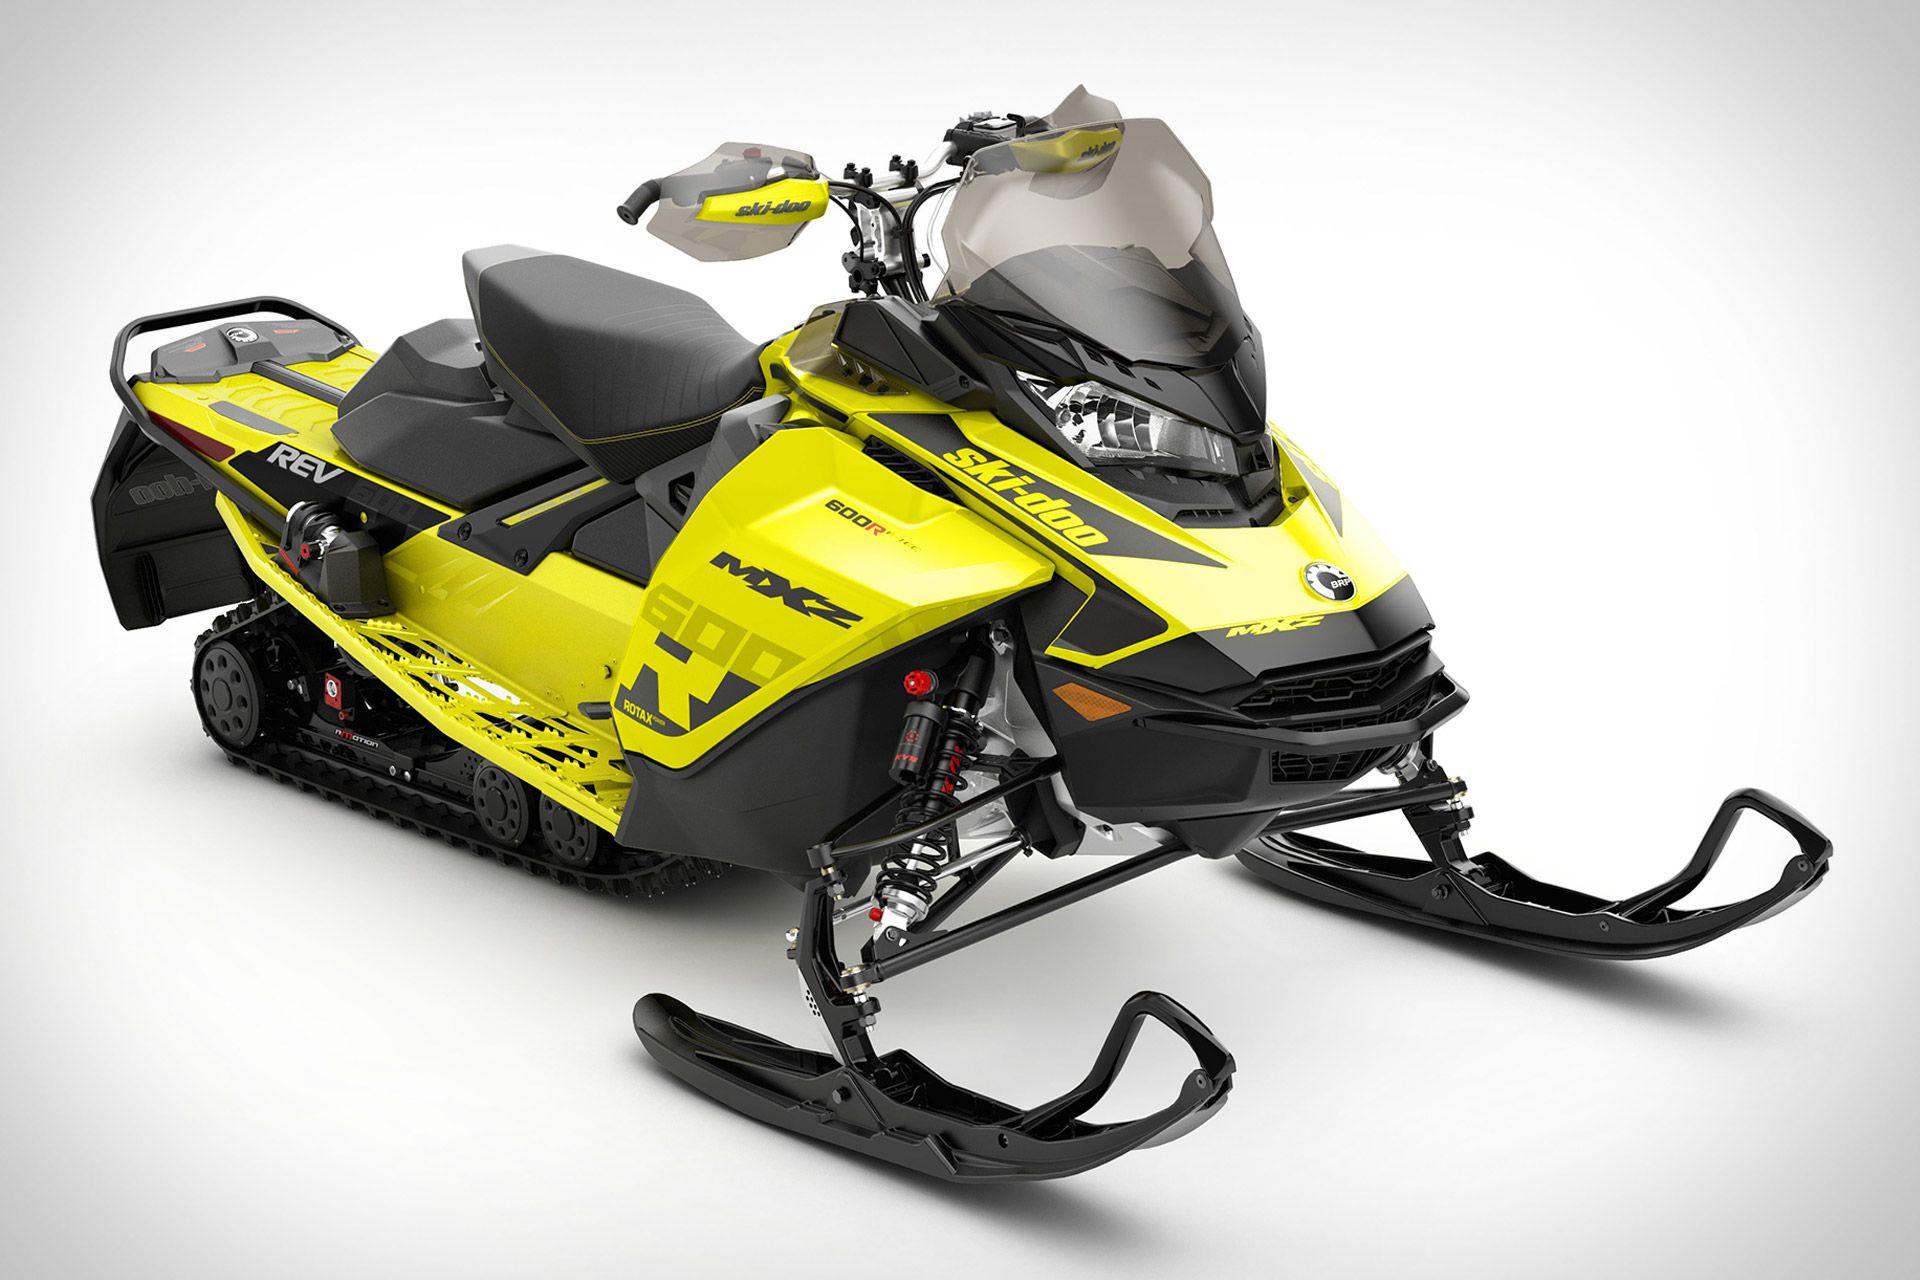 Ski Doo Mxz 600r E Tec Snowmobile